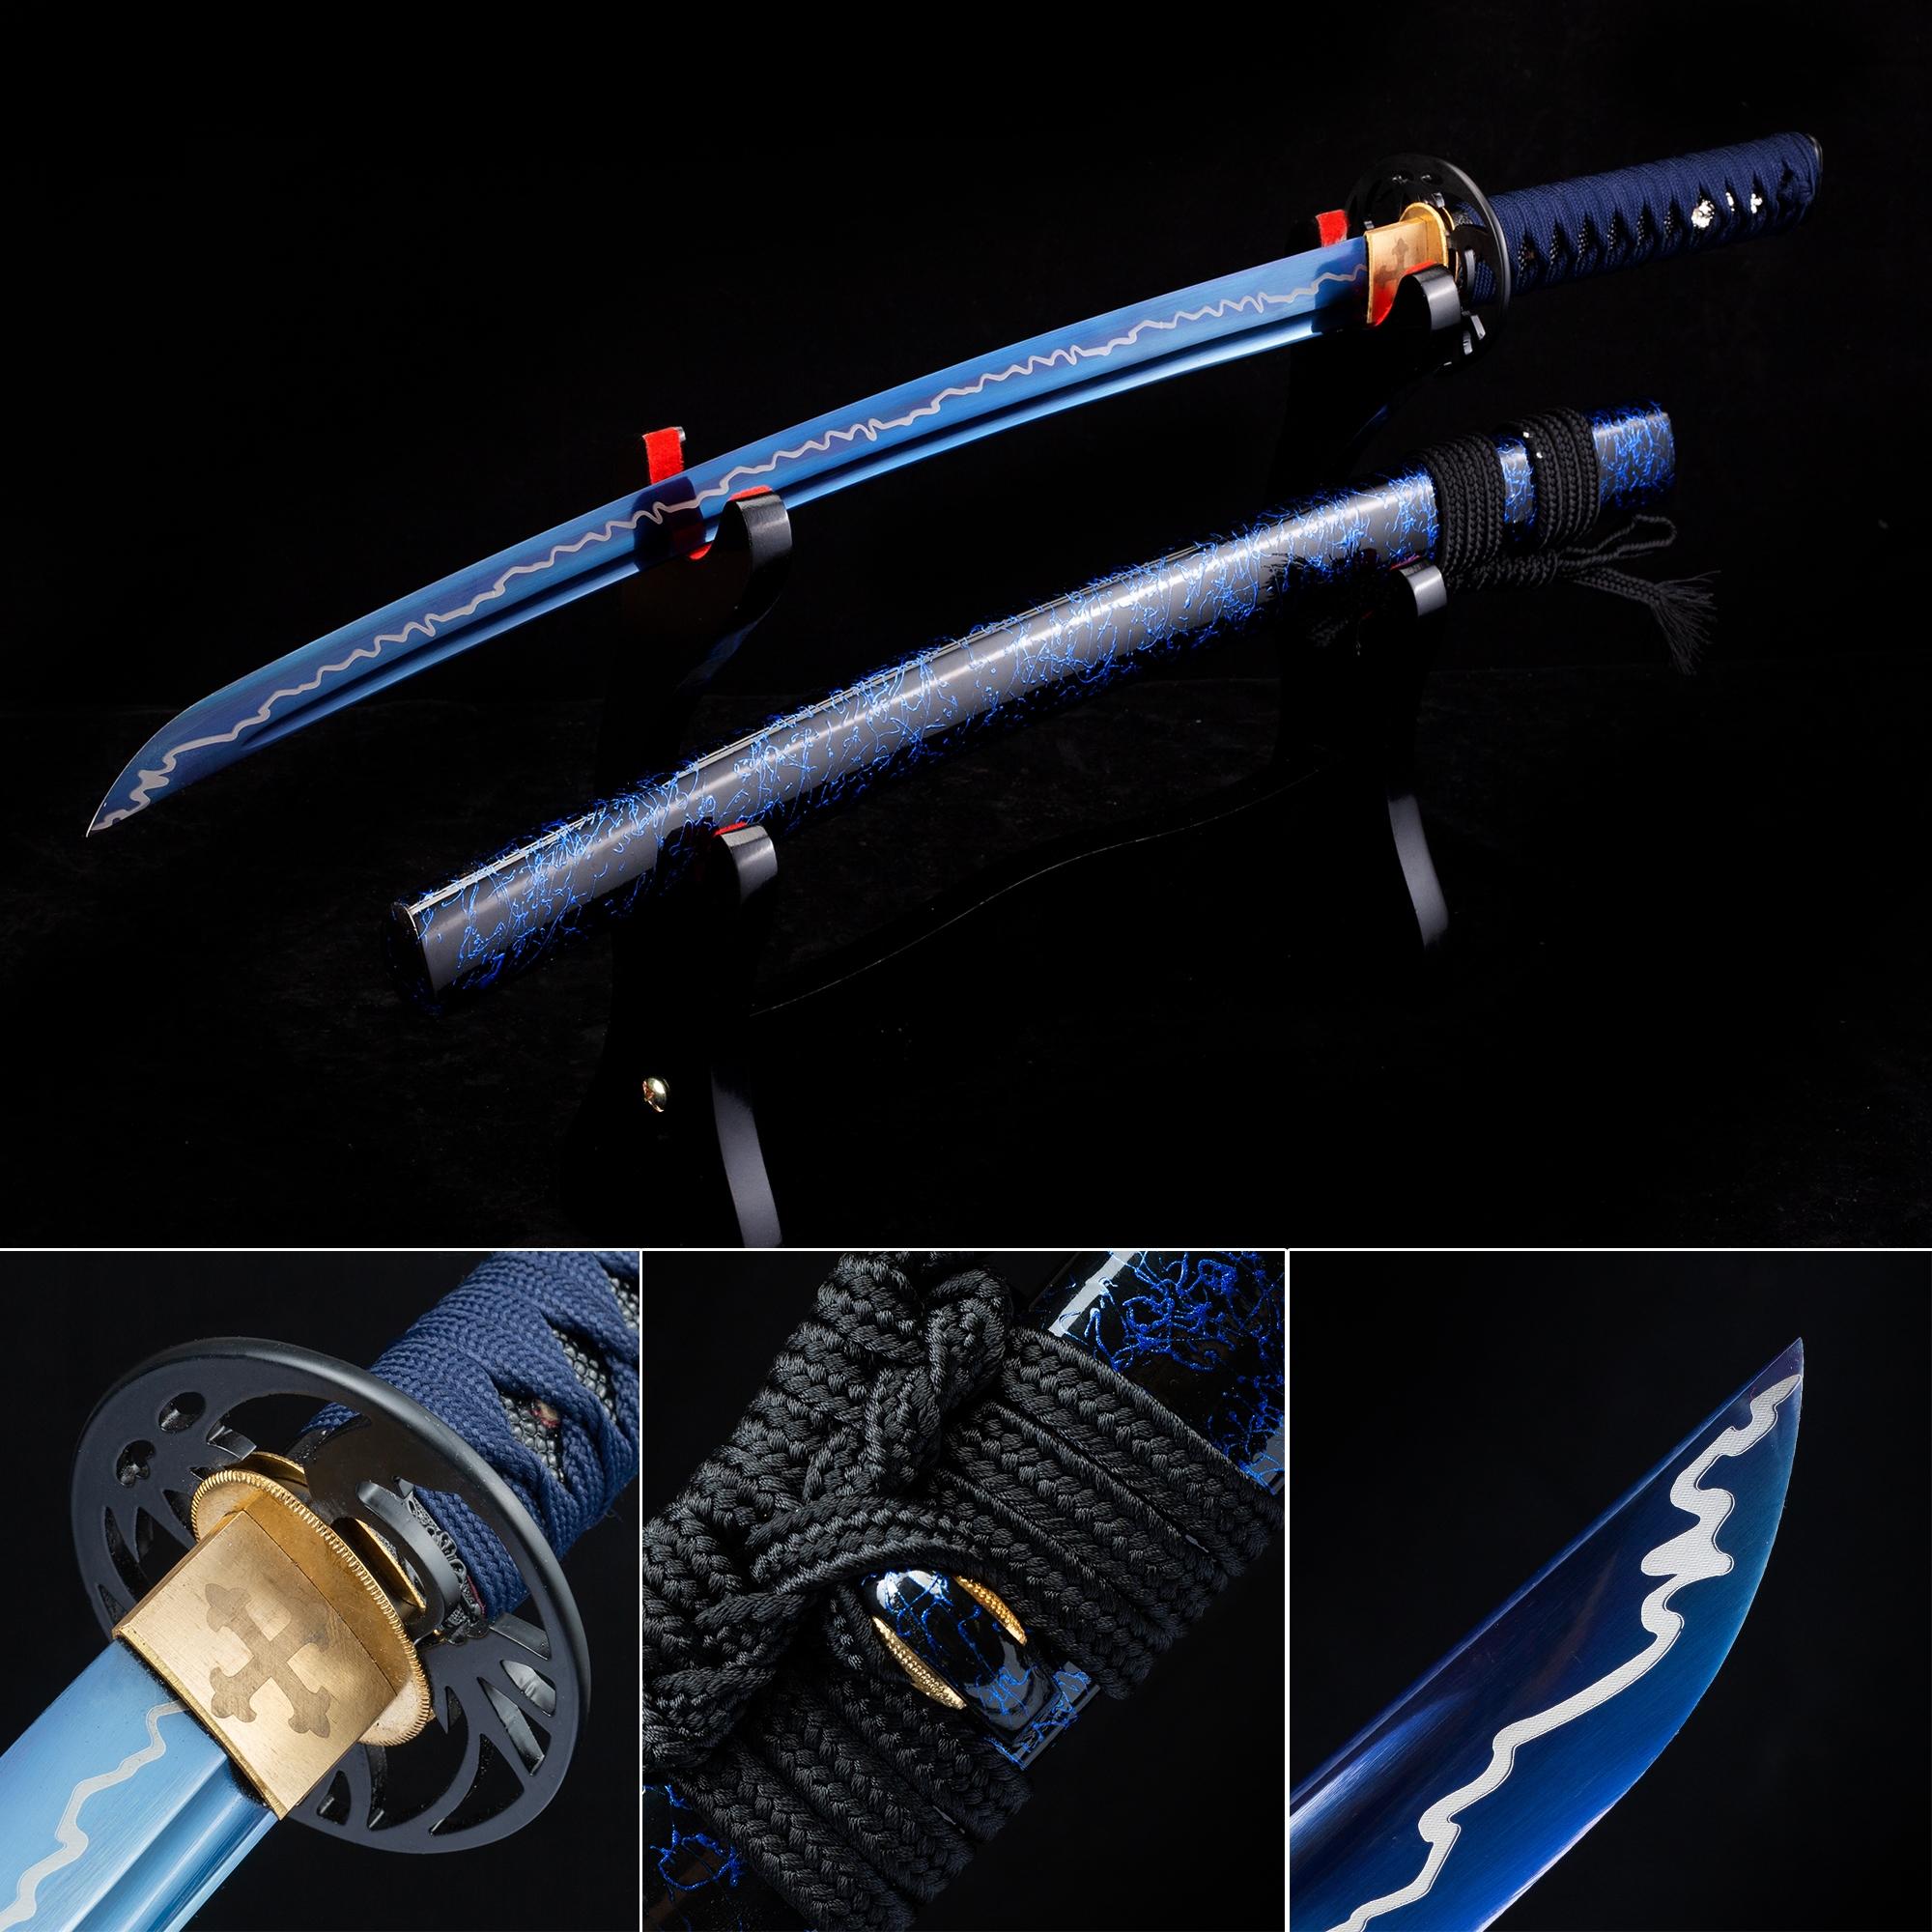 Handmade High Manganese Steel Blue Blade Japanese Wakizashi Swords With Blue Scabbard